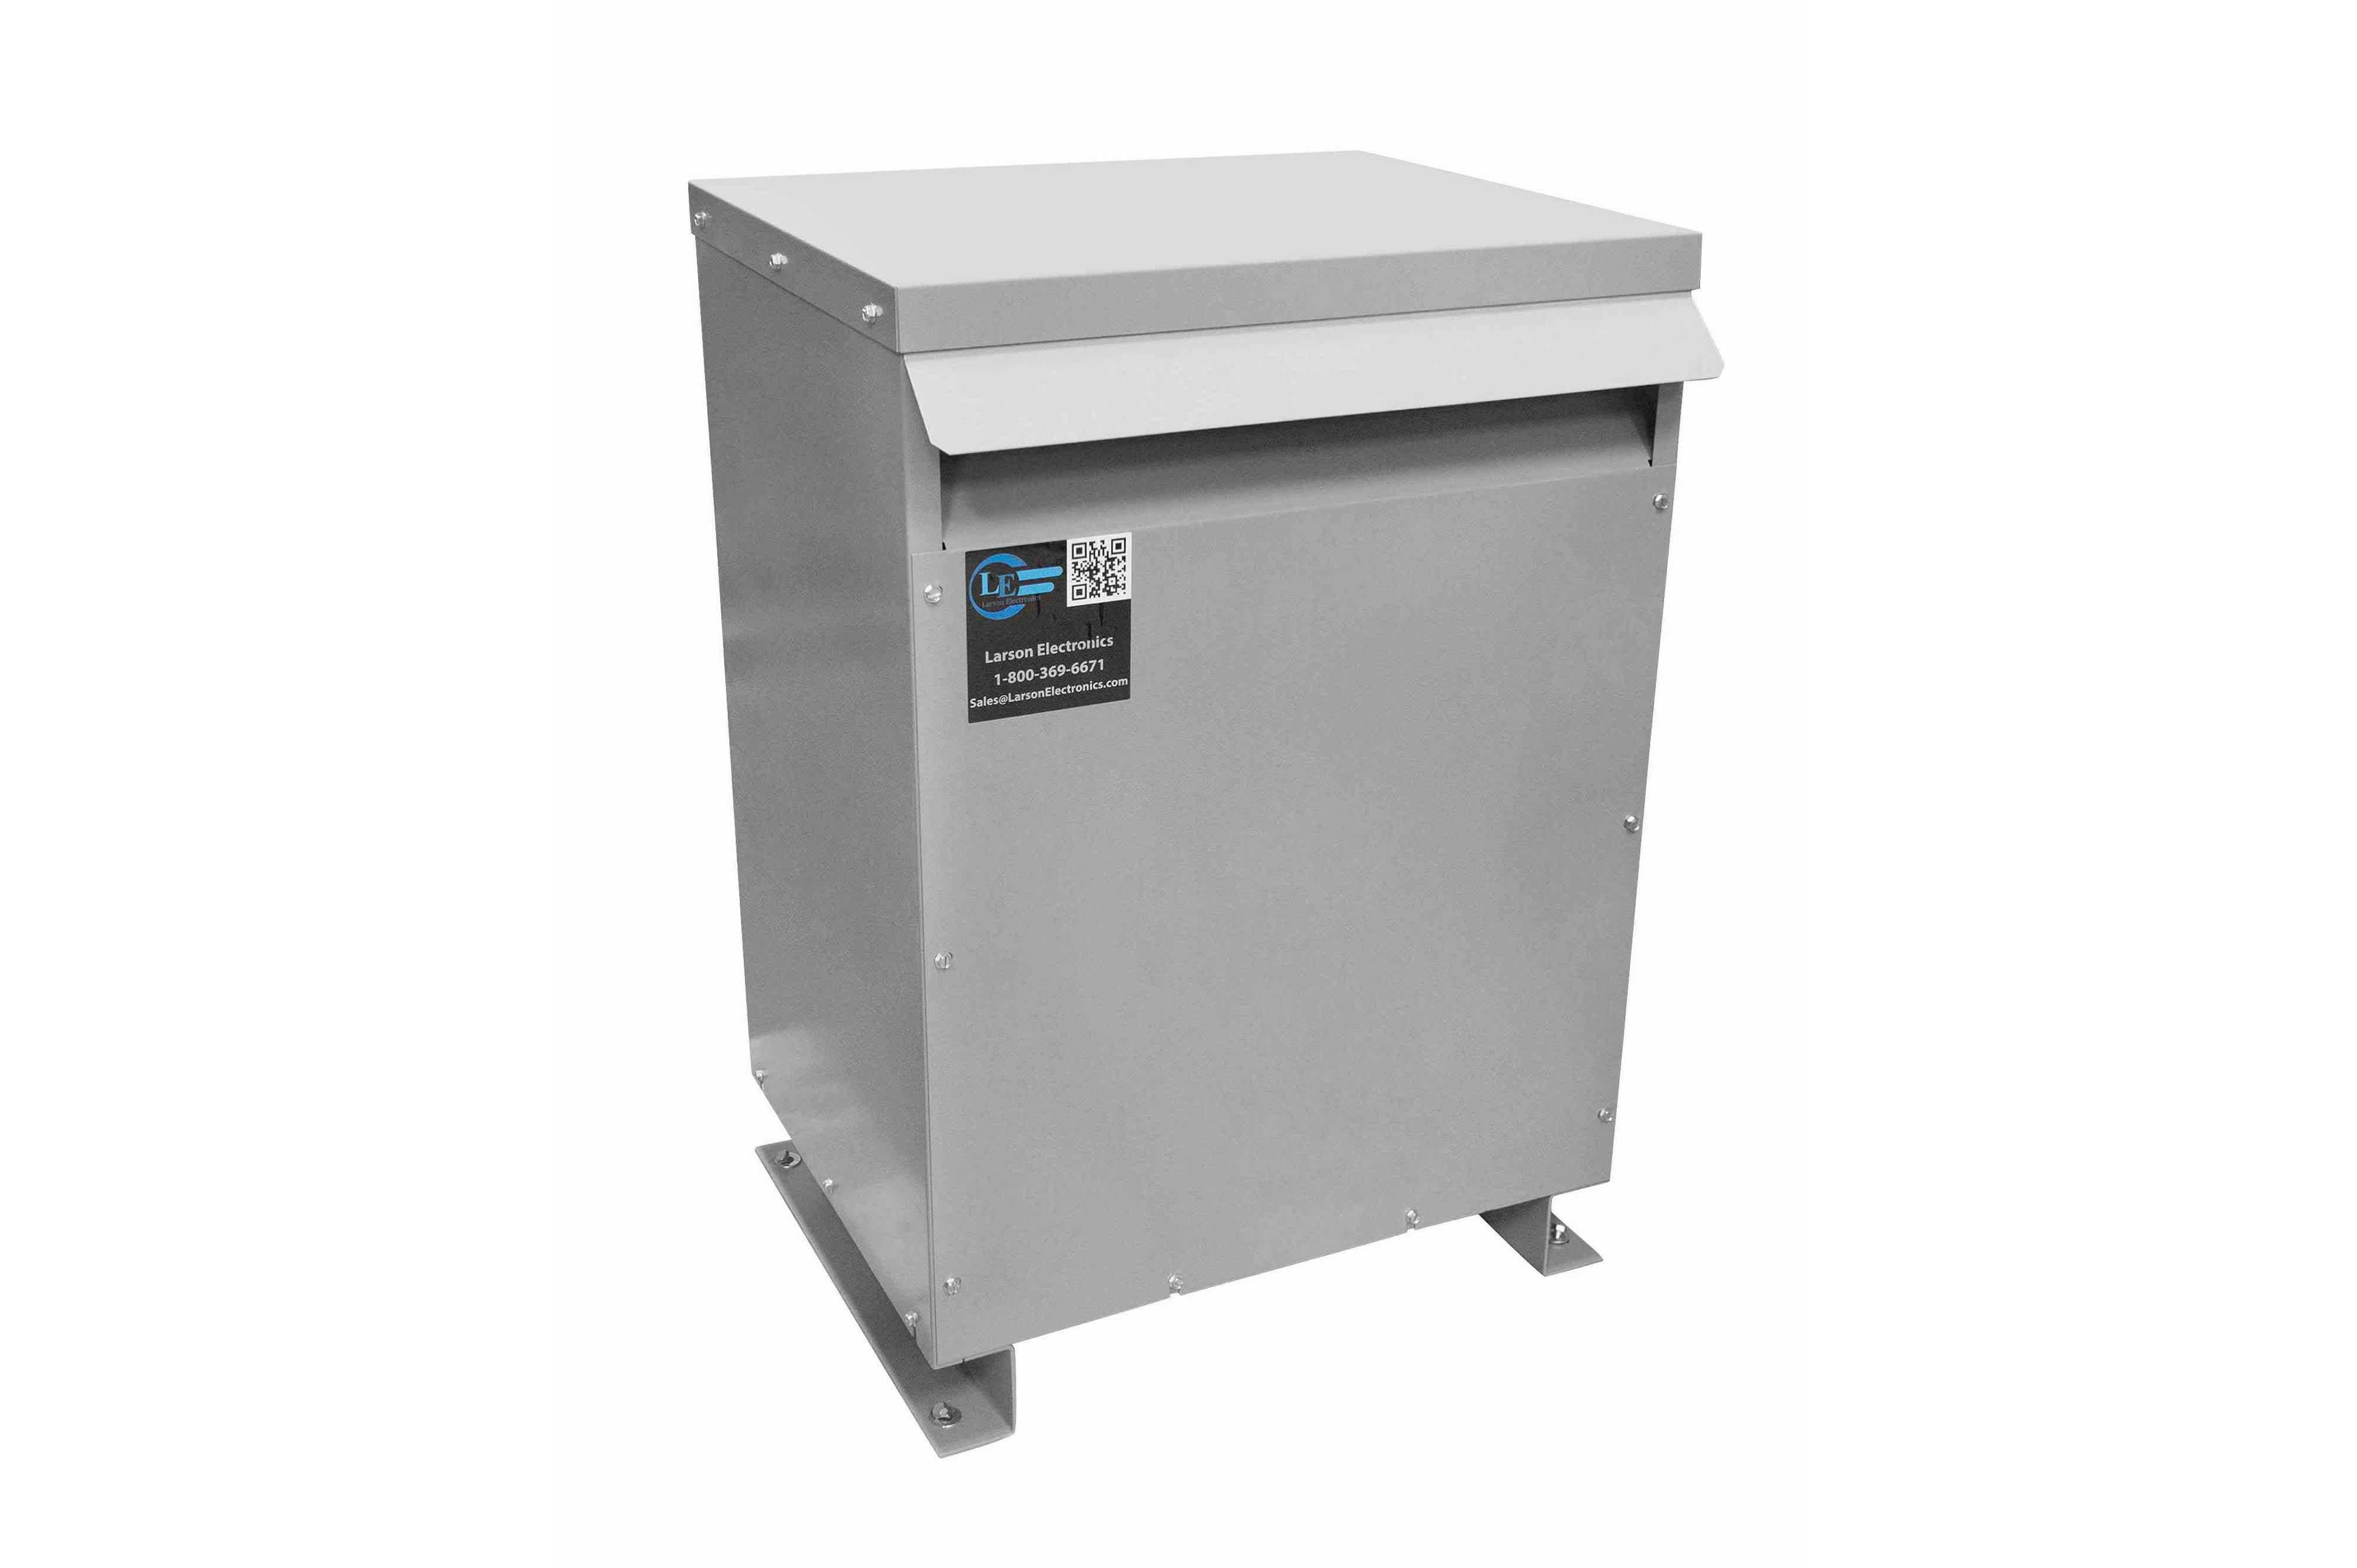 25 kVA 3PH Isolation Transformer, 208V Wye Primary, 415V Delta Secondary, N3R, Ventilated, 60 Hz